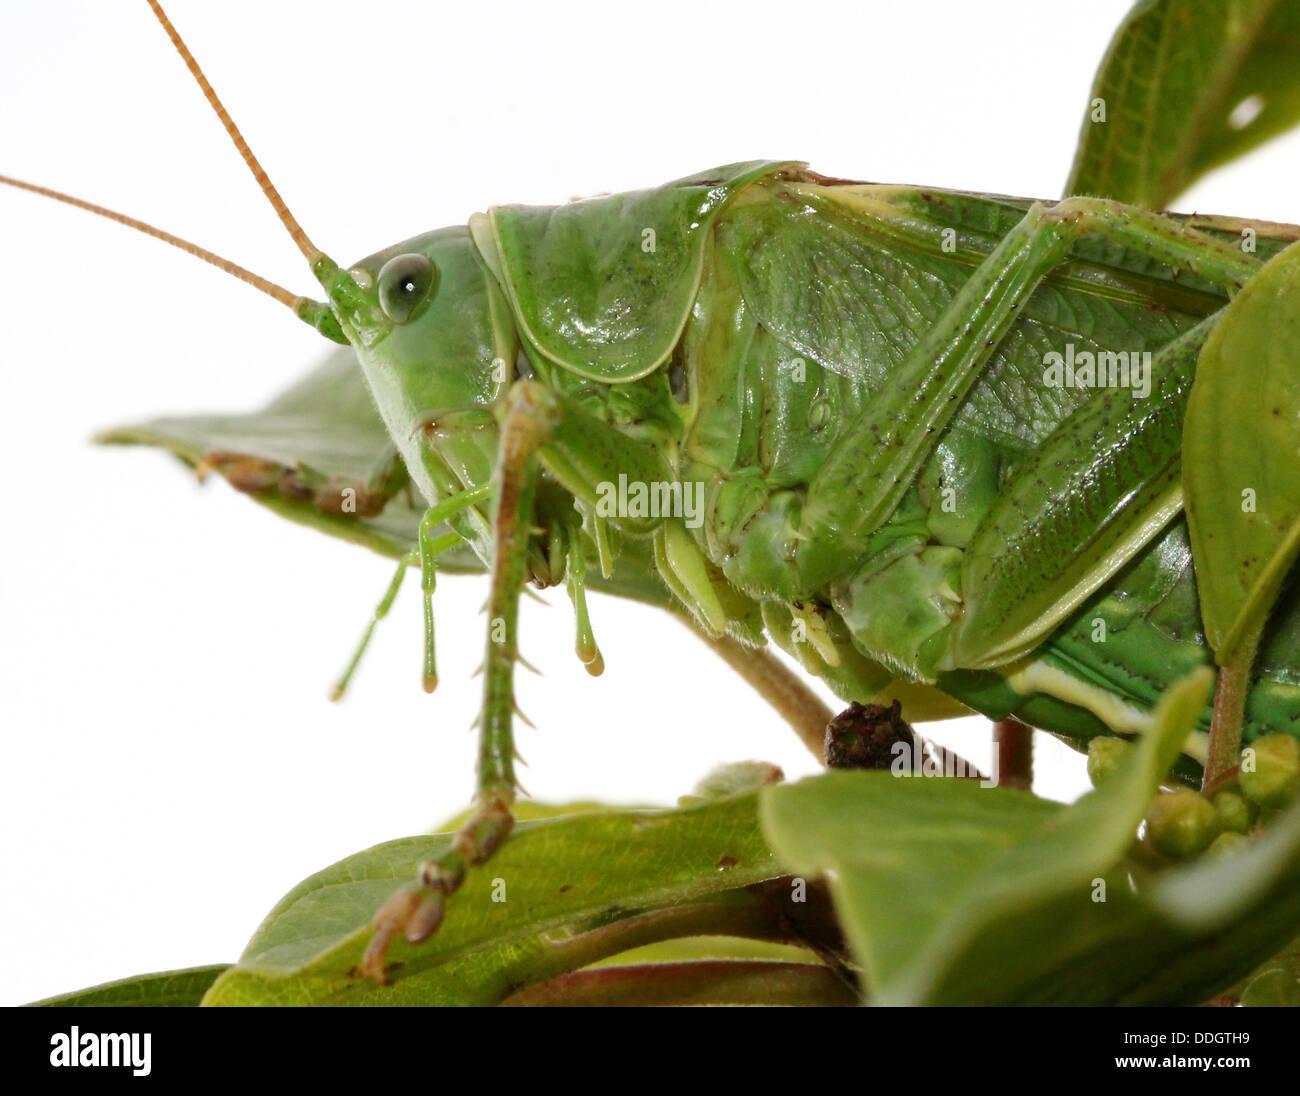 Weiblichen europäischen Great Green Bush Cricket (Tettigonia Viridissima) Inm Nahaufnahme. Stockbild